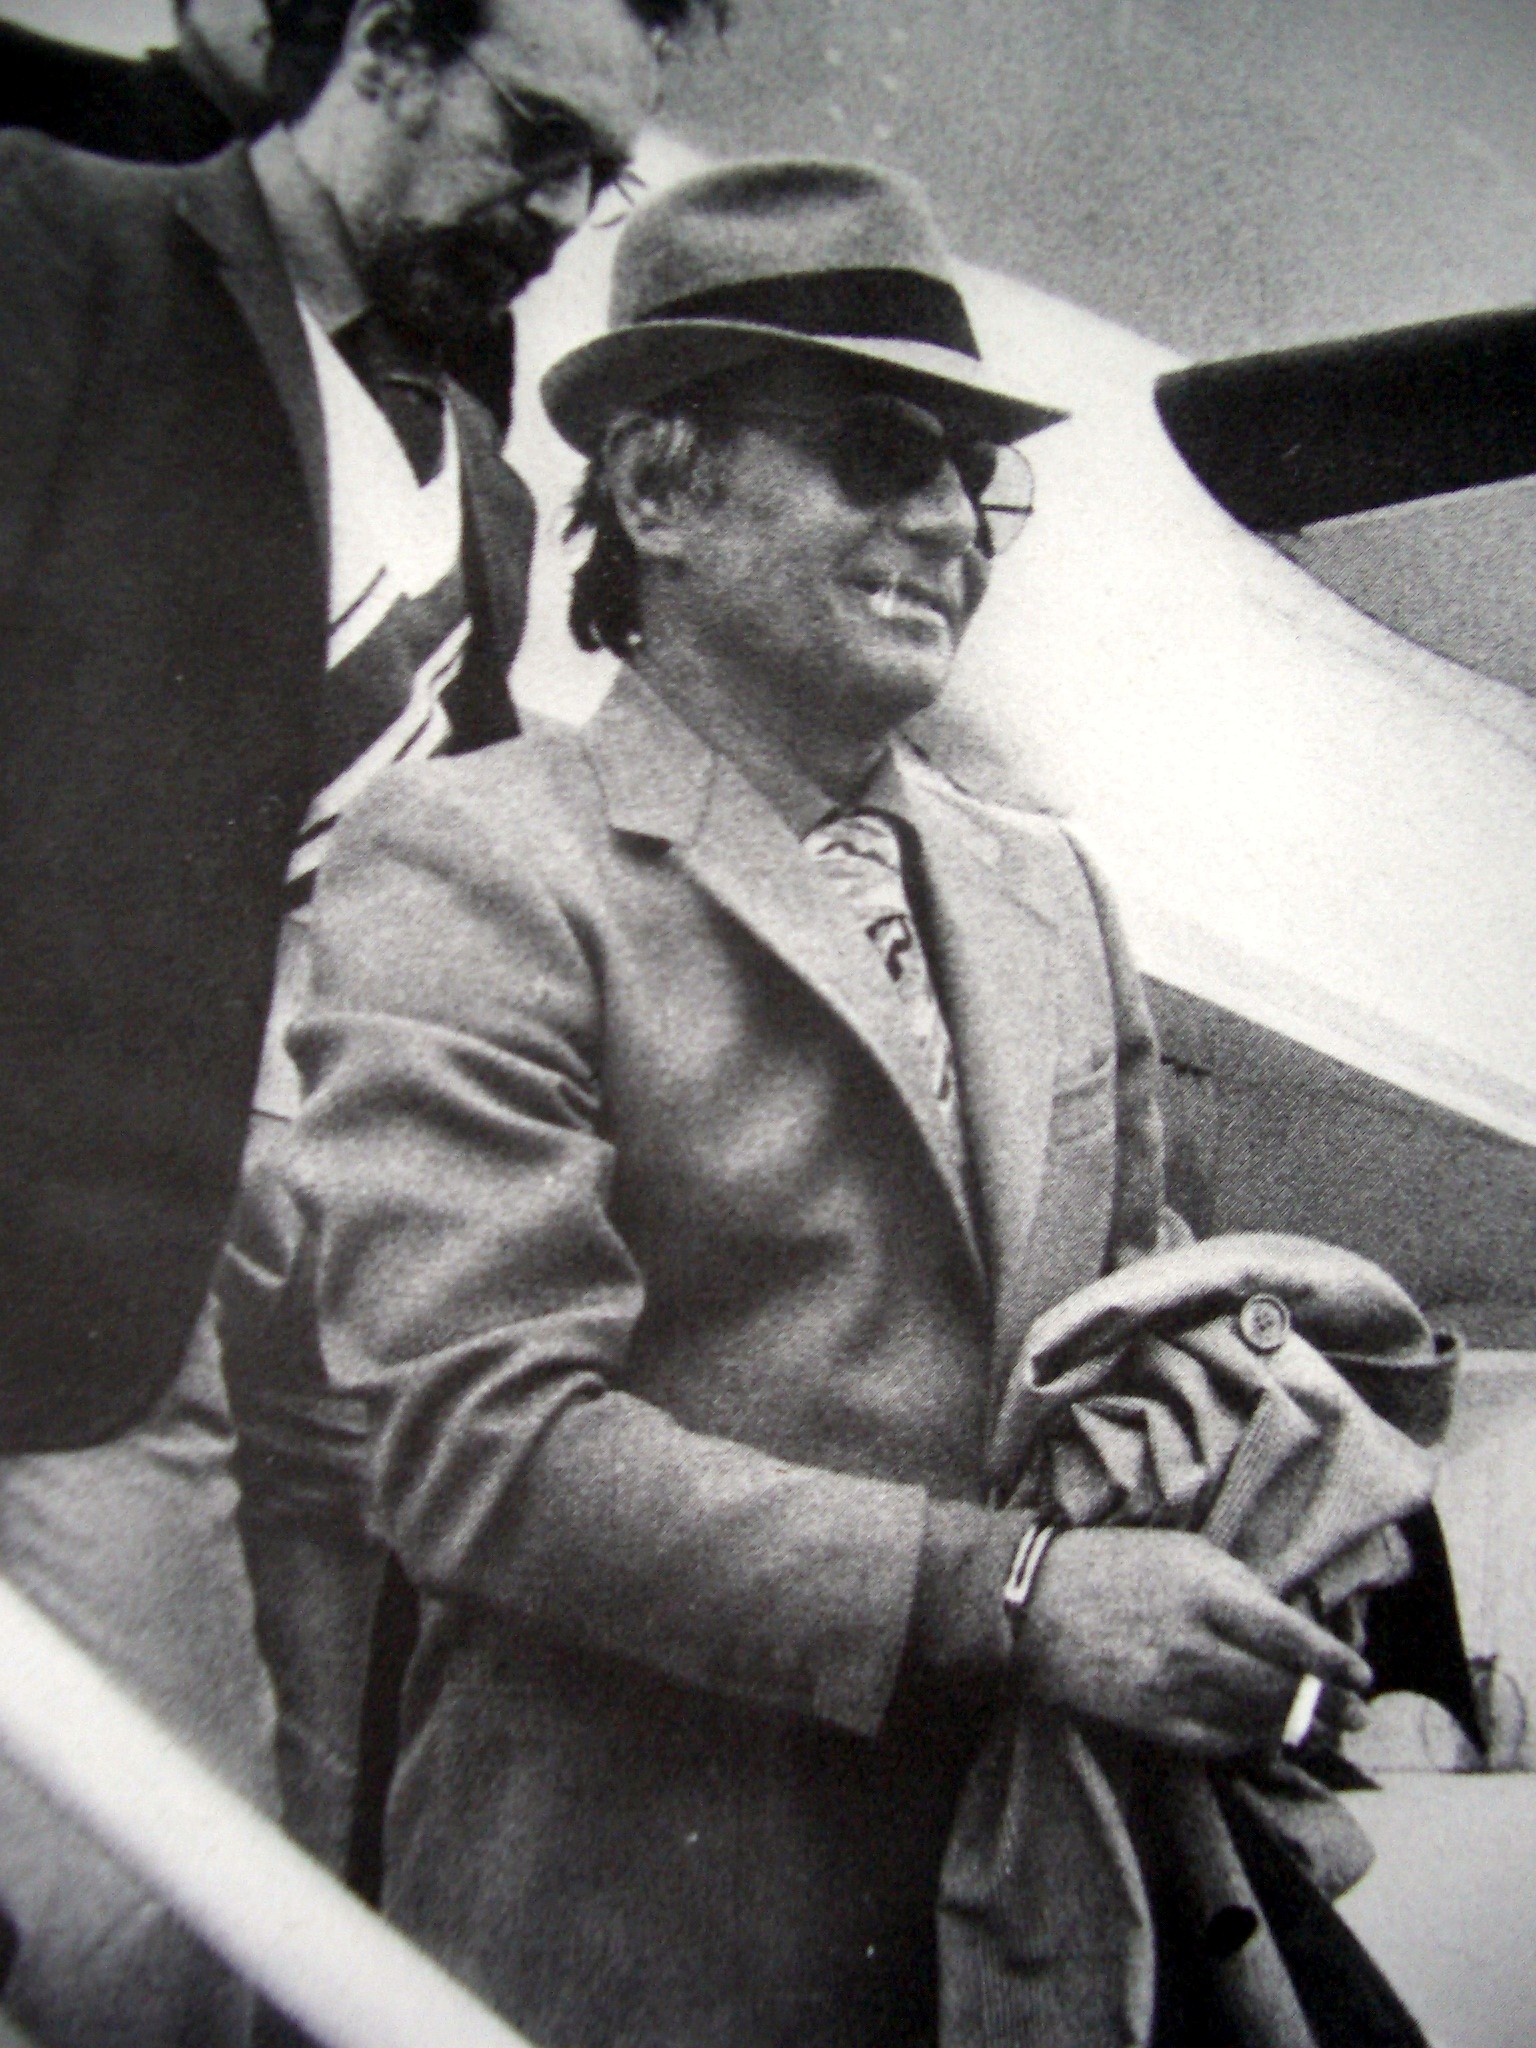 Angelo La Barbera